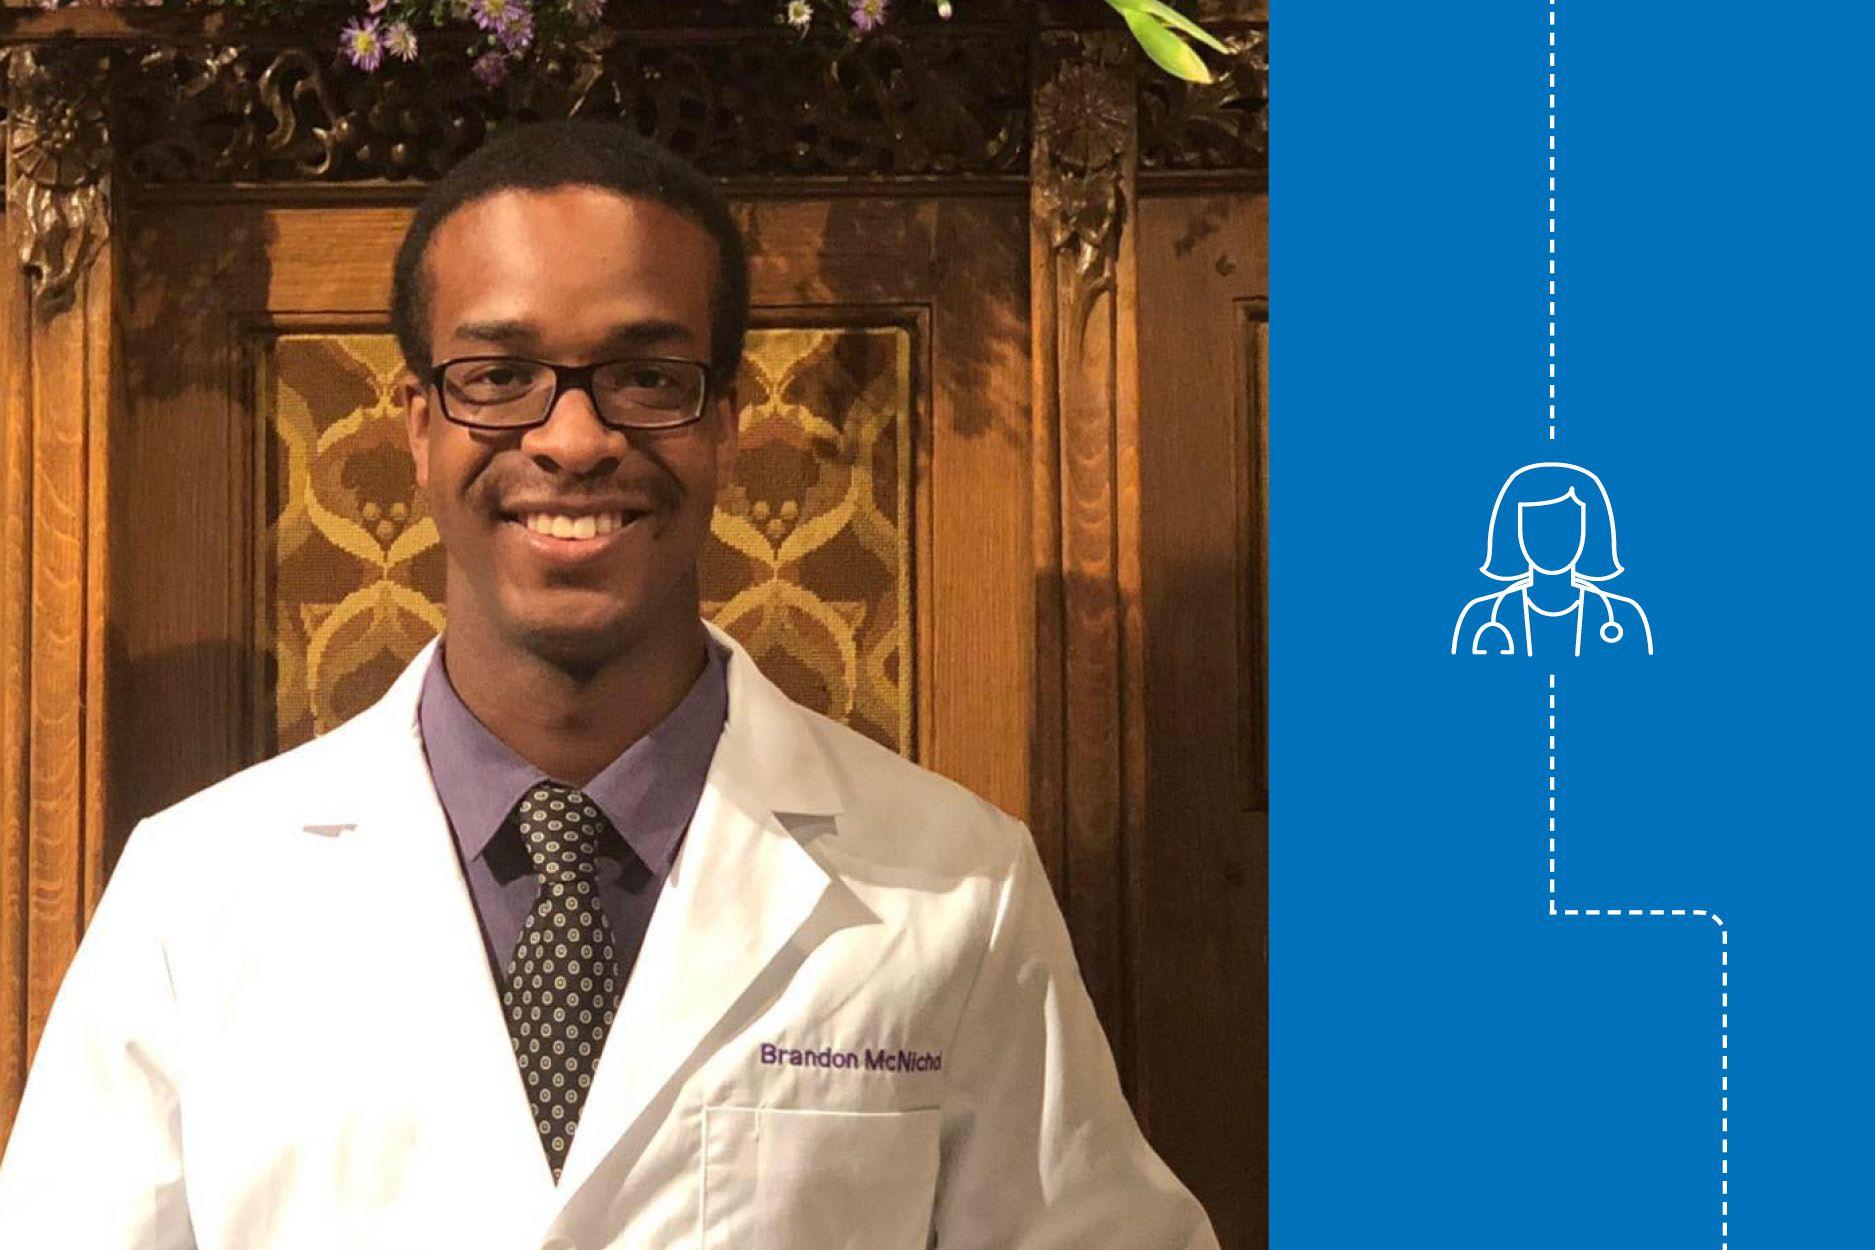 Brandon McNichol pictured in his lab coat.